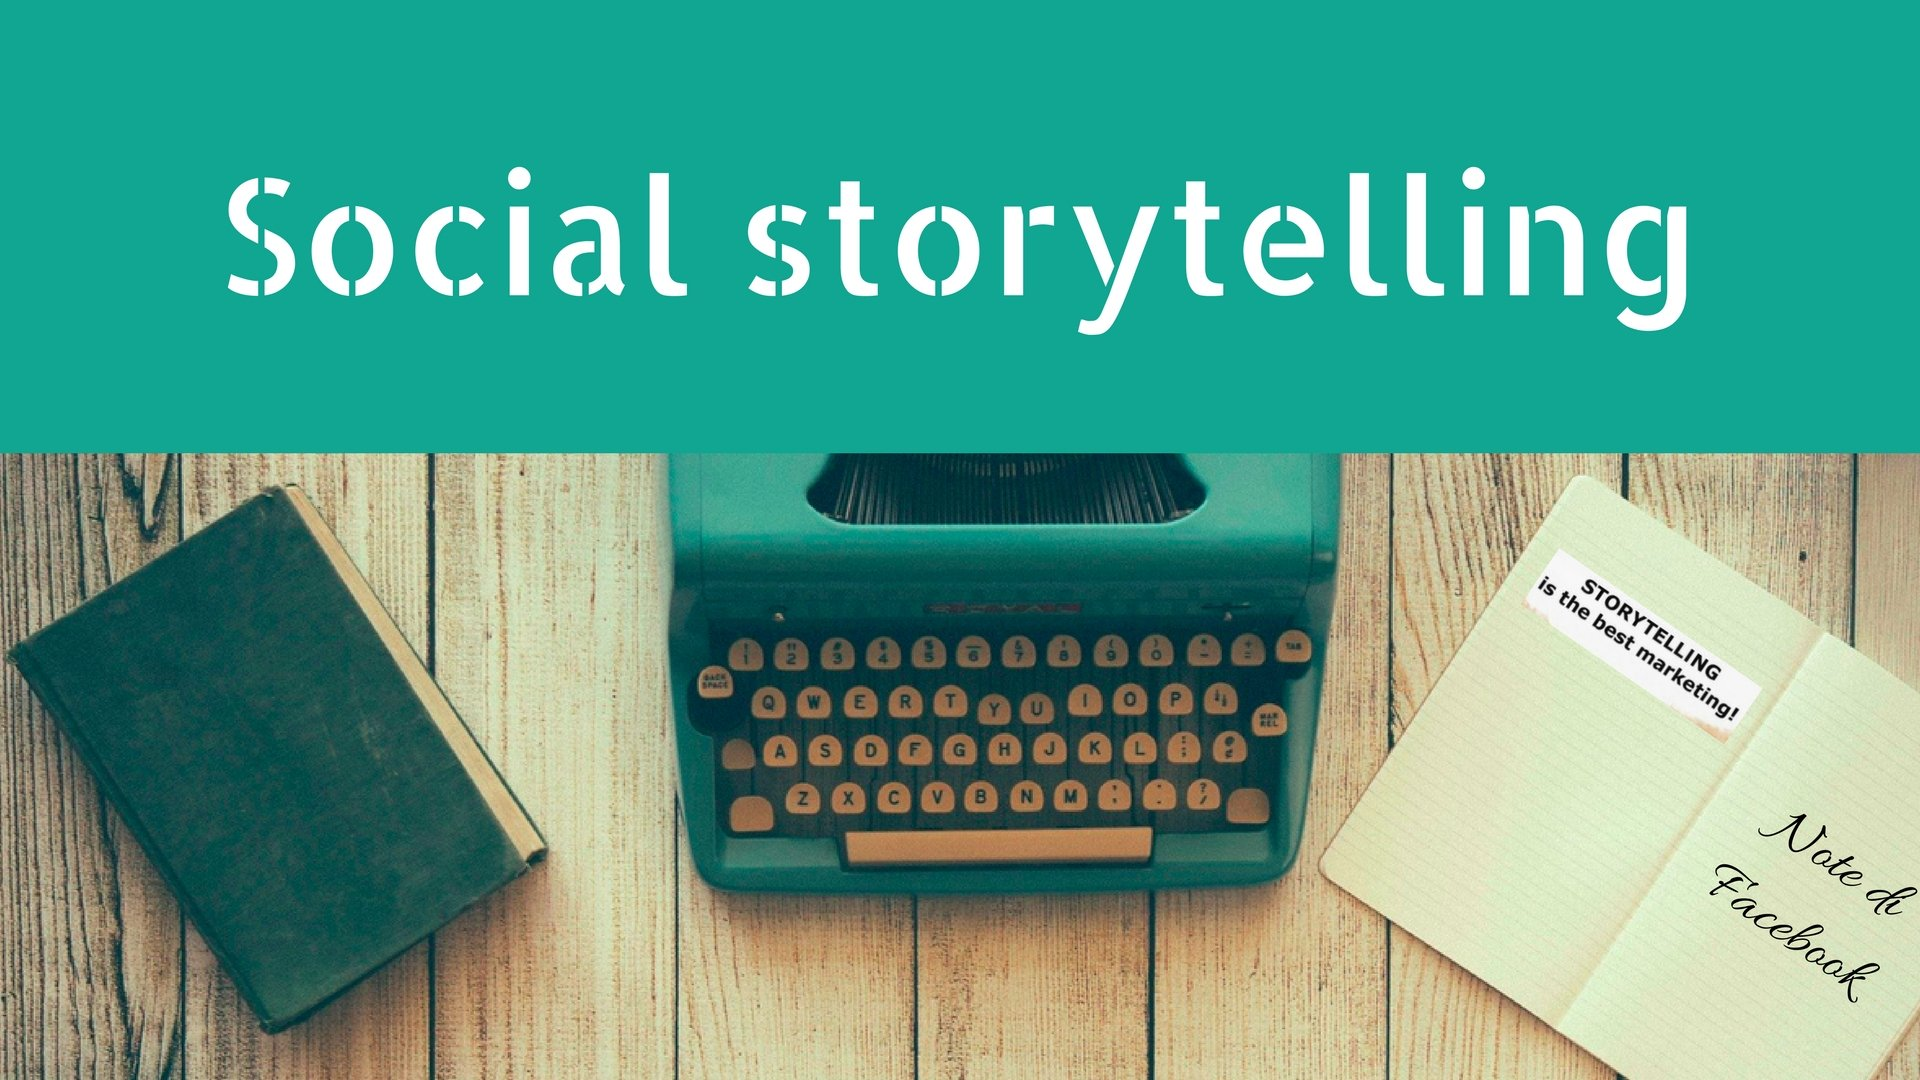 FacebookNote per uno storytelling social